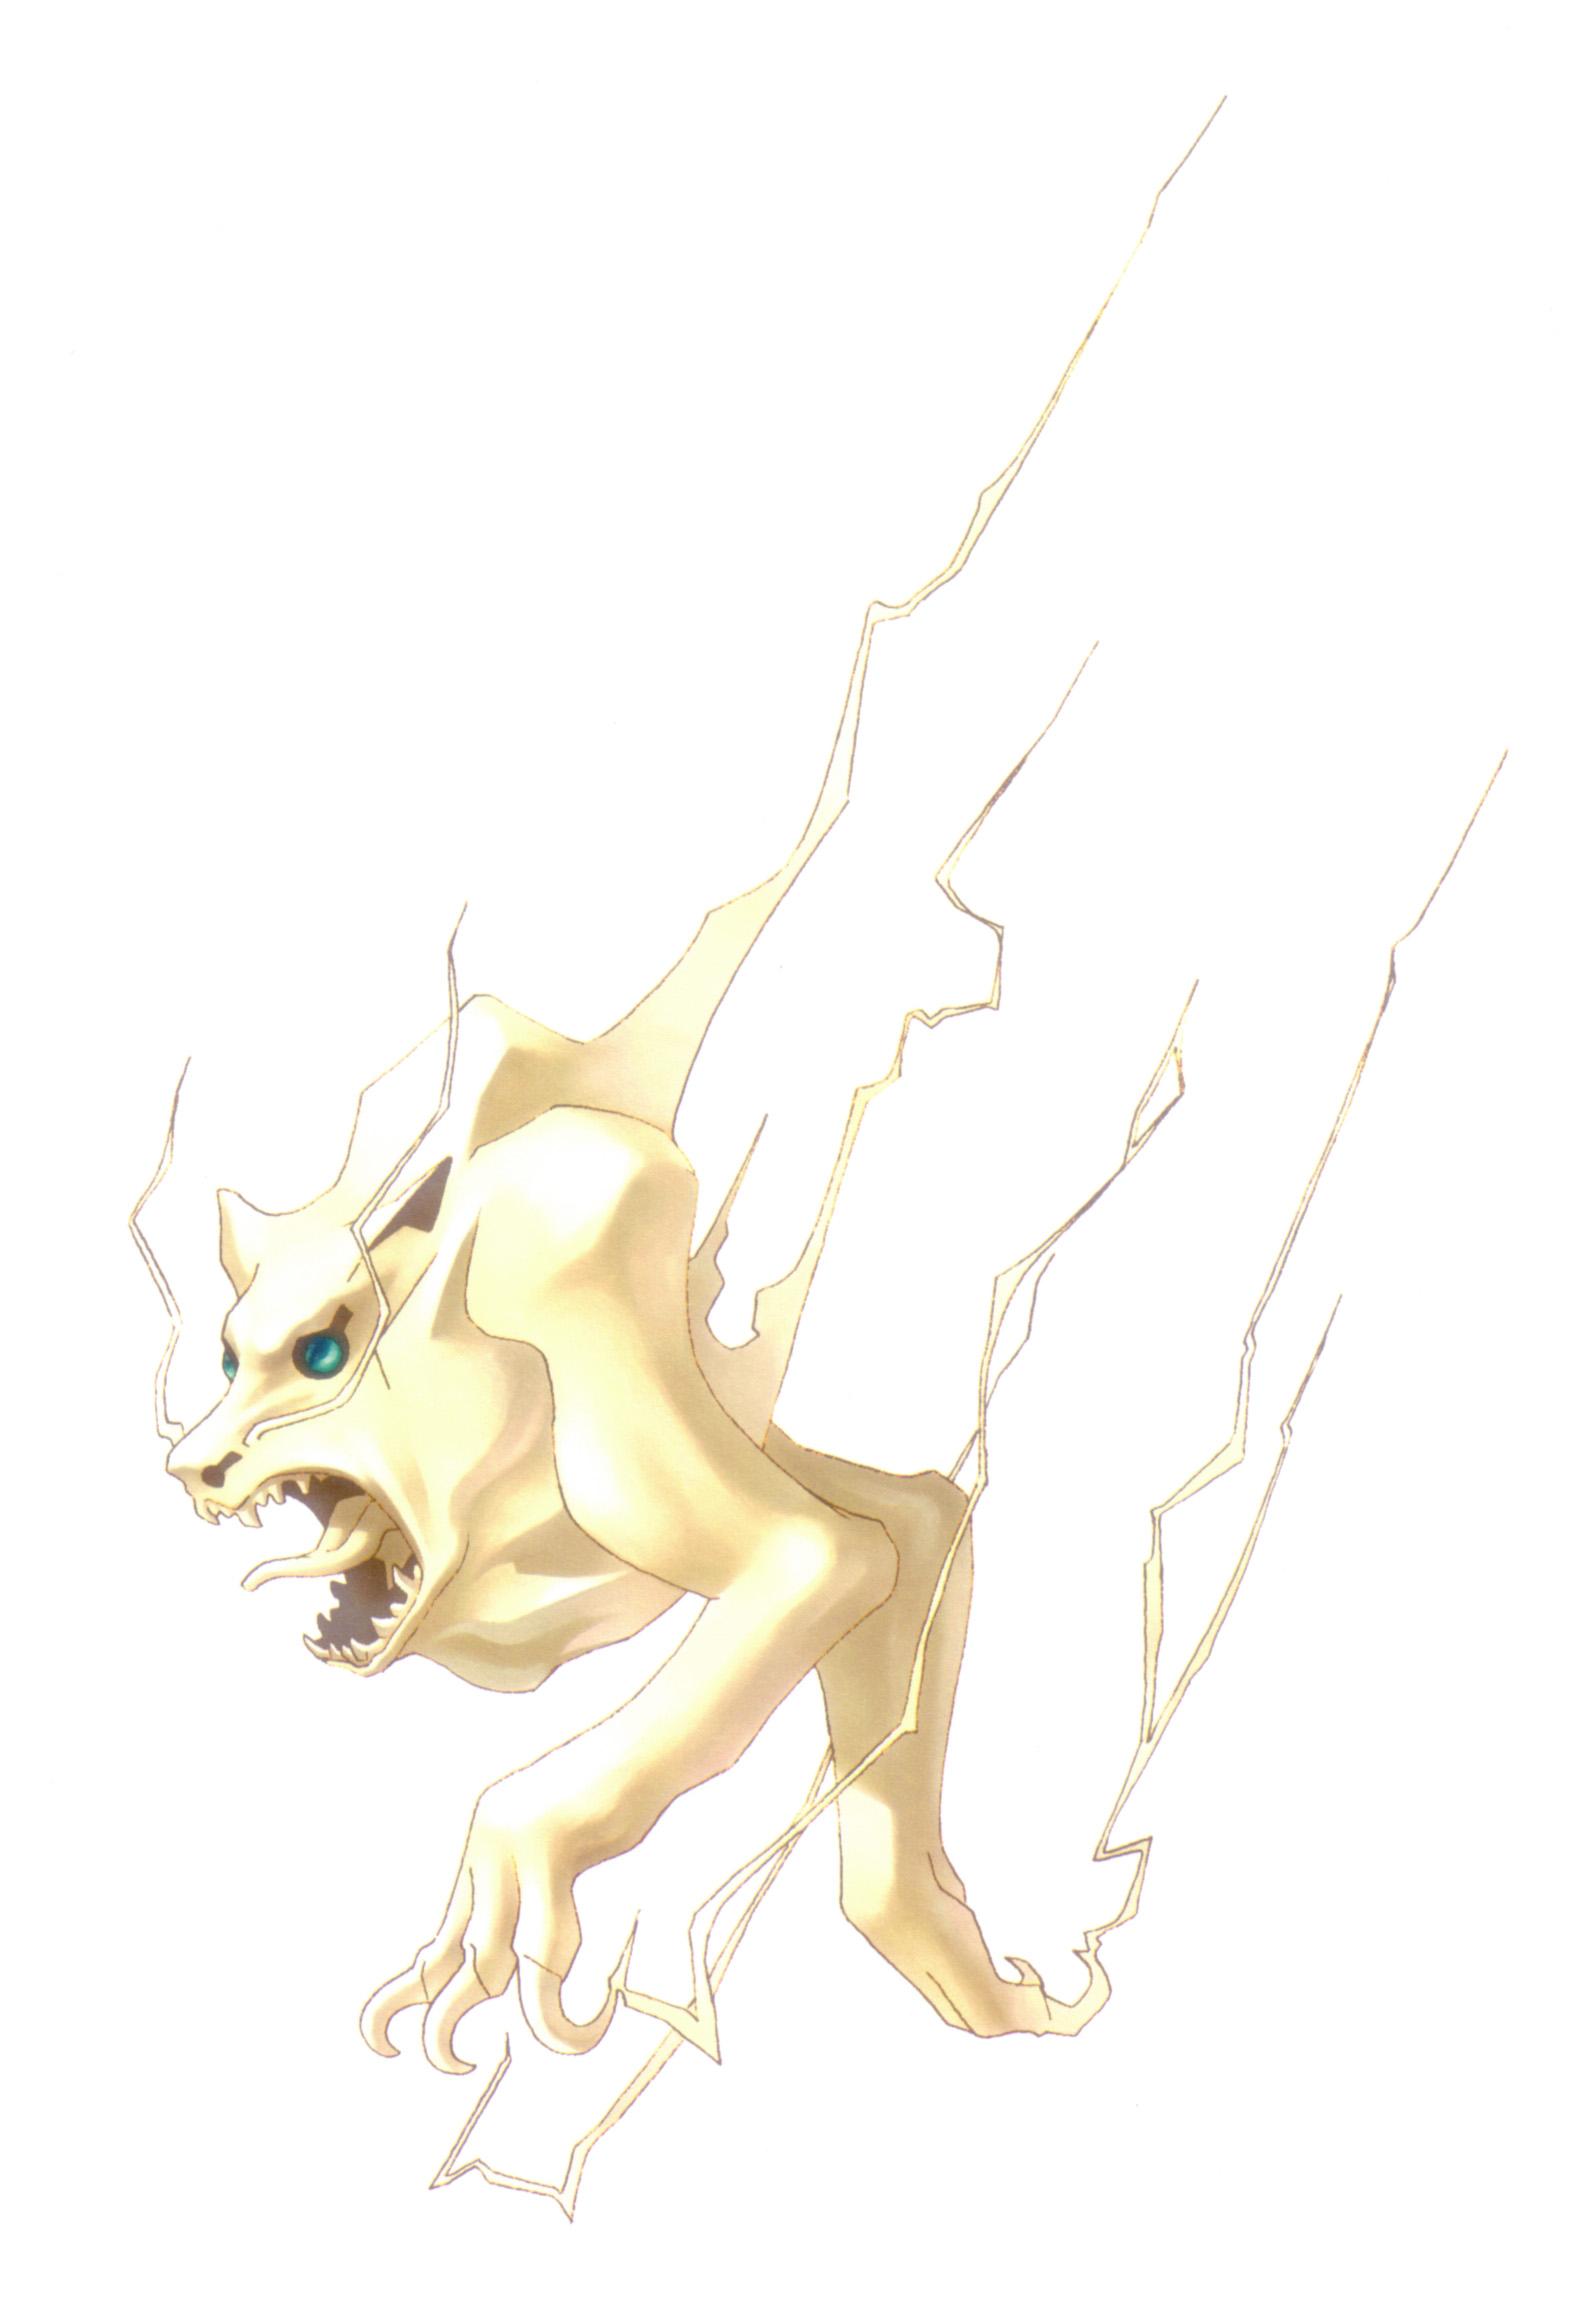 Raijuu Megami Tensei Wiki Fandom 1yr · personamaven · r/megaten. raijuu megami tensei wiki fandom